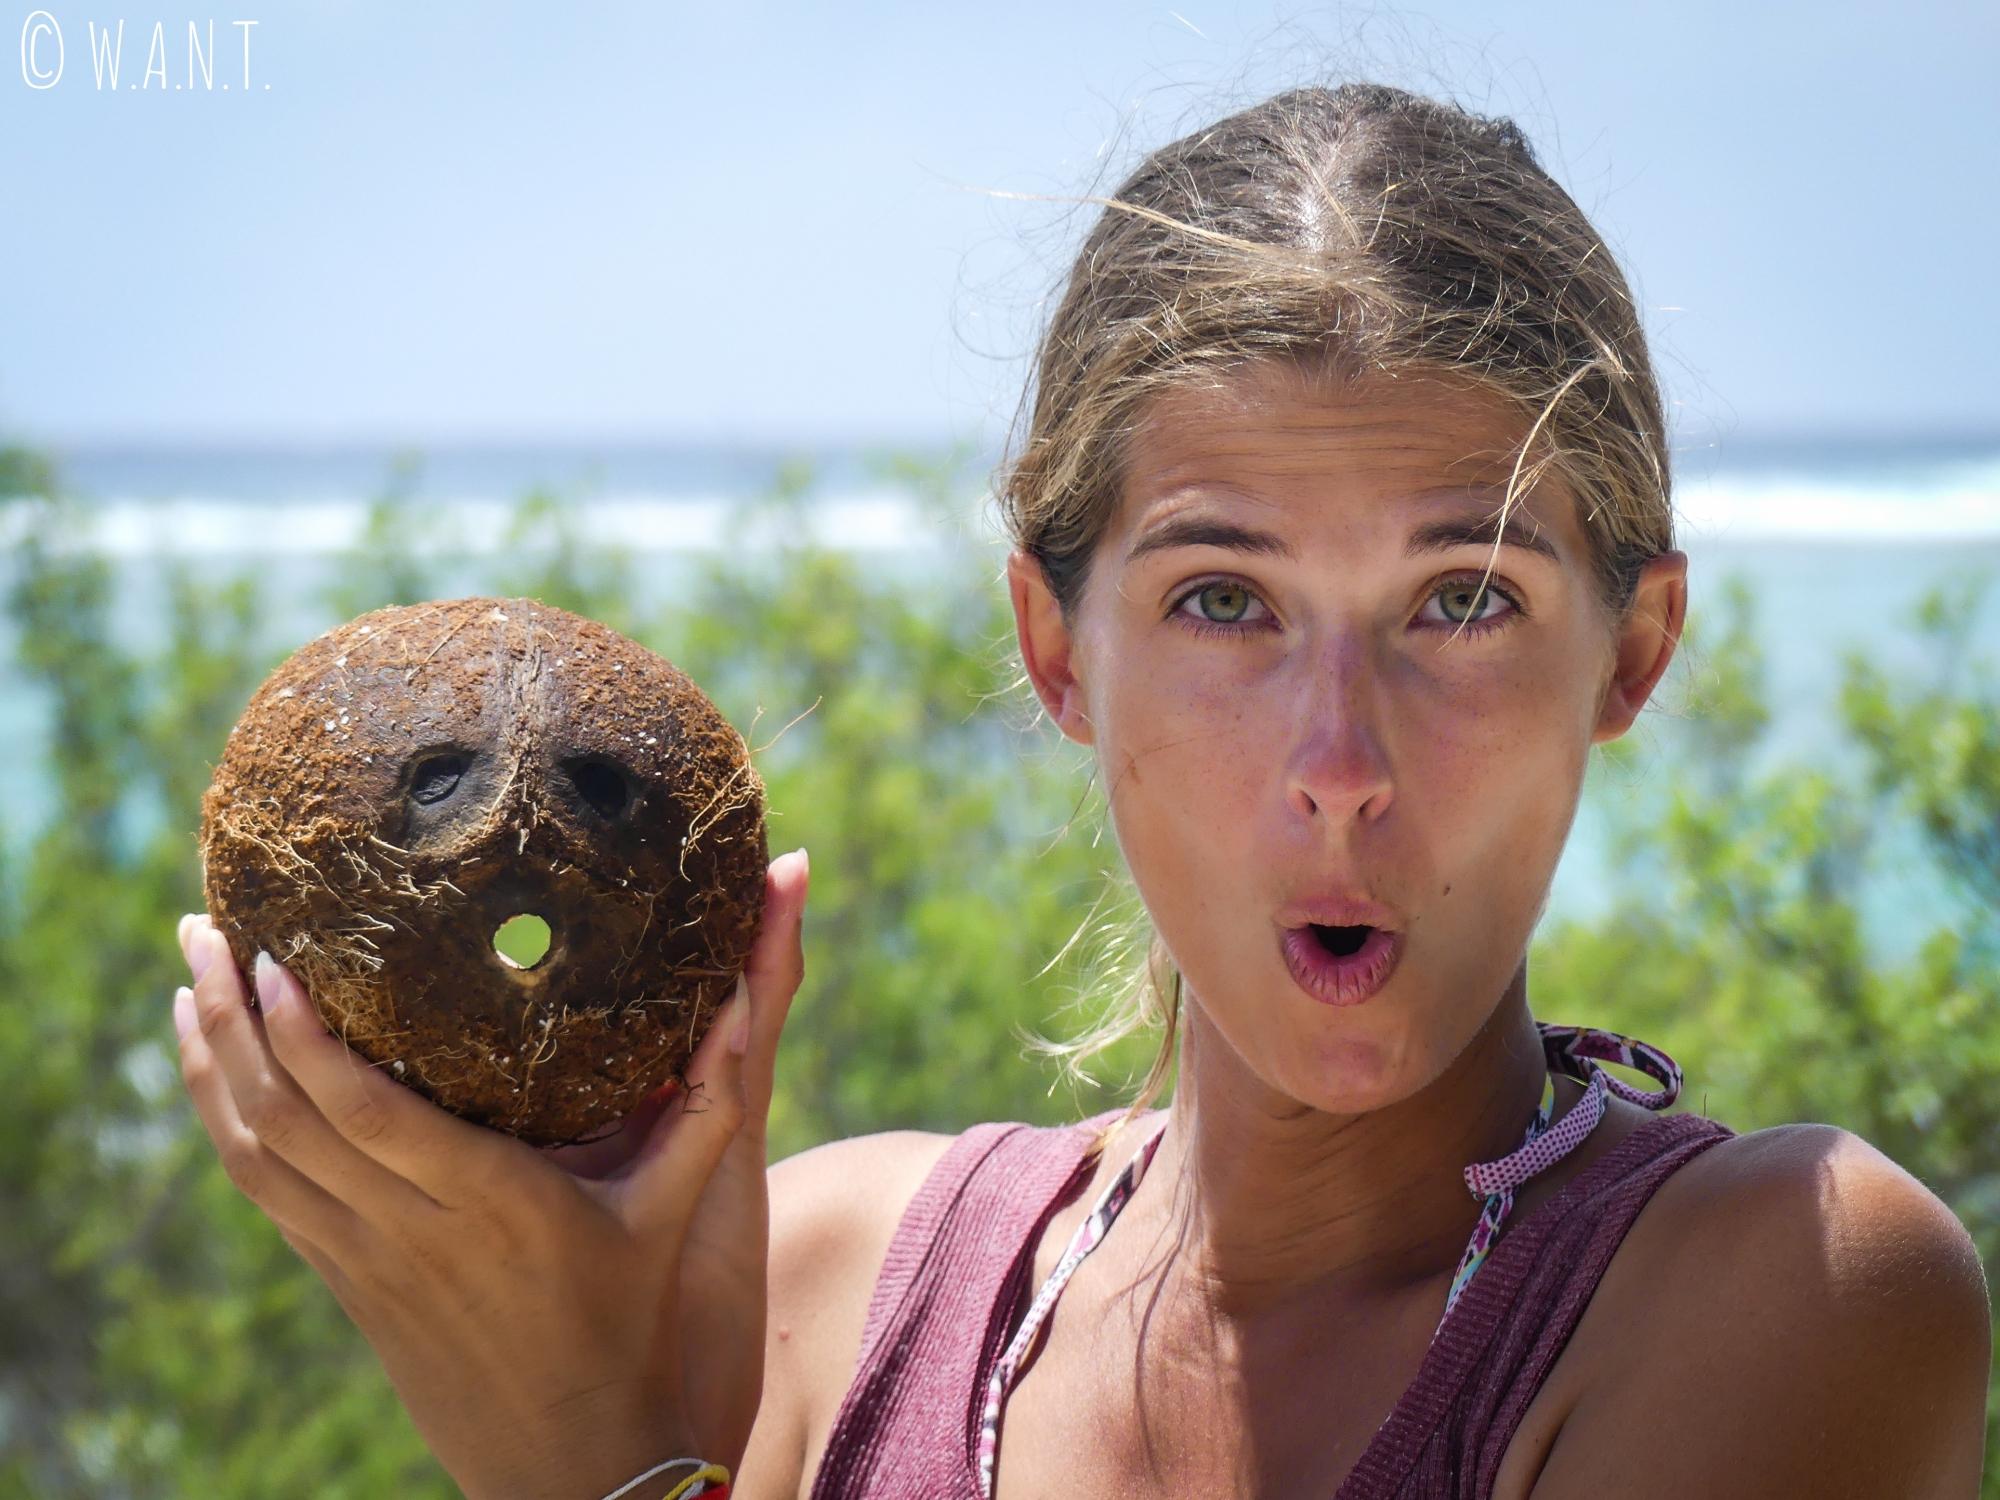 Marion et sa surprenante imitation de la noix de coco